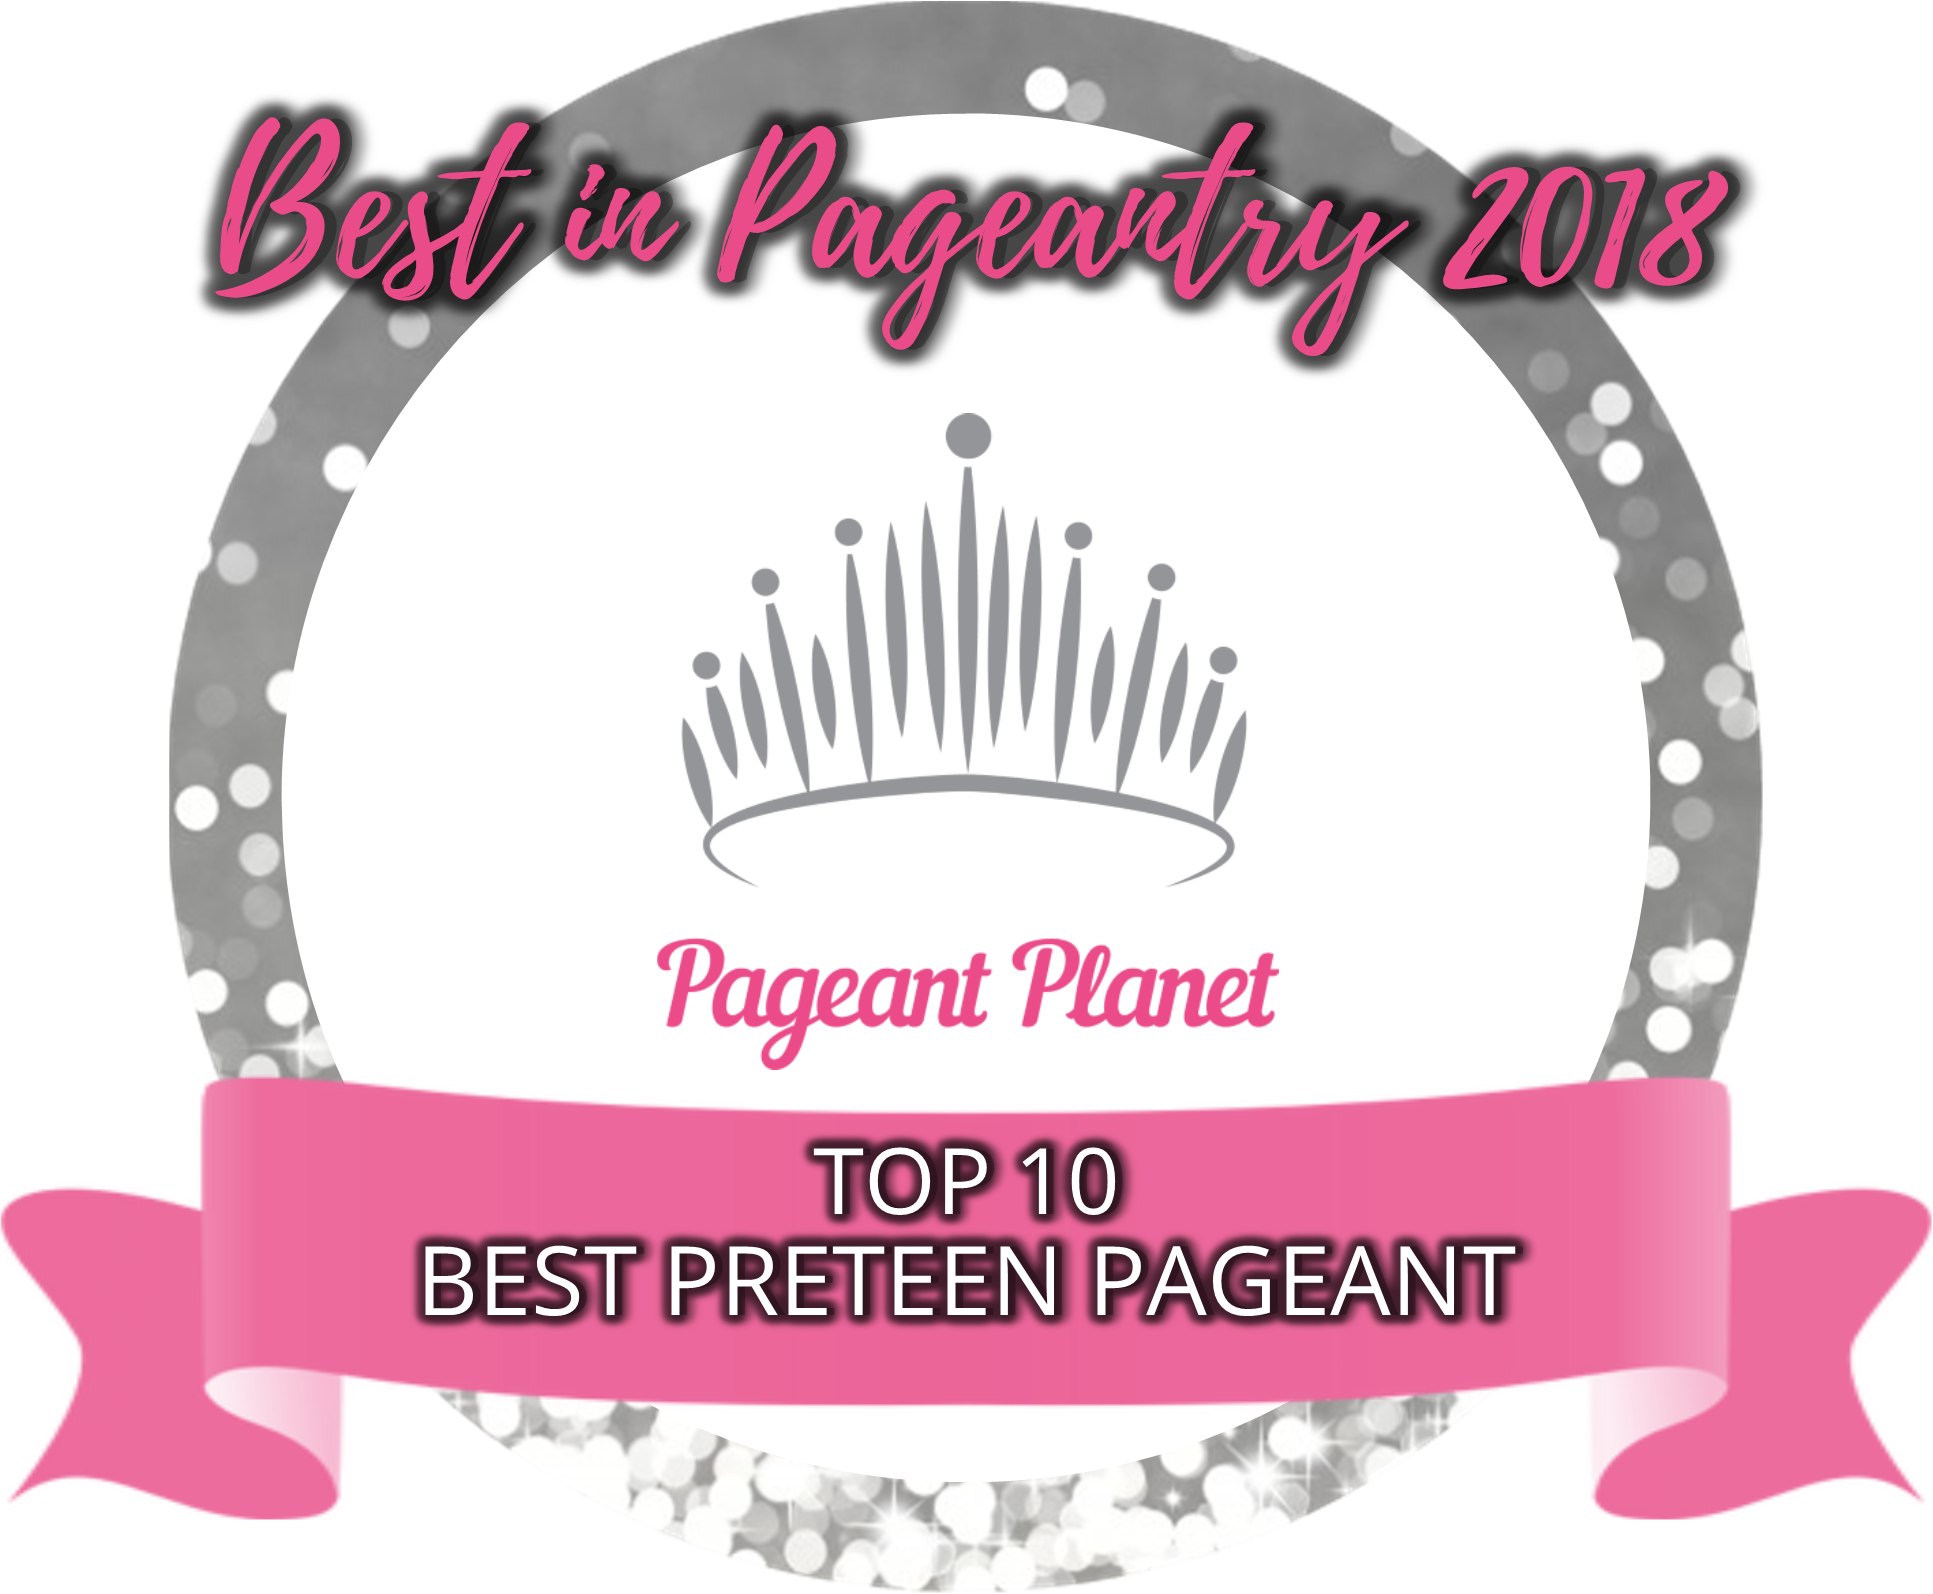 Top 10 Best Preteen Pageant of 2018